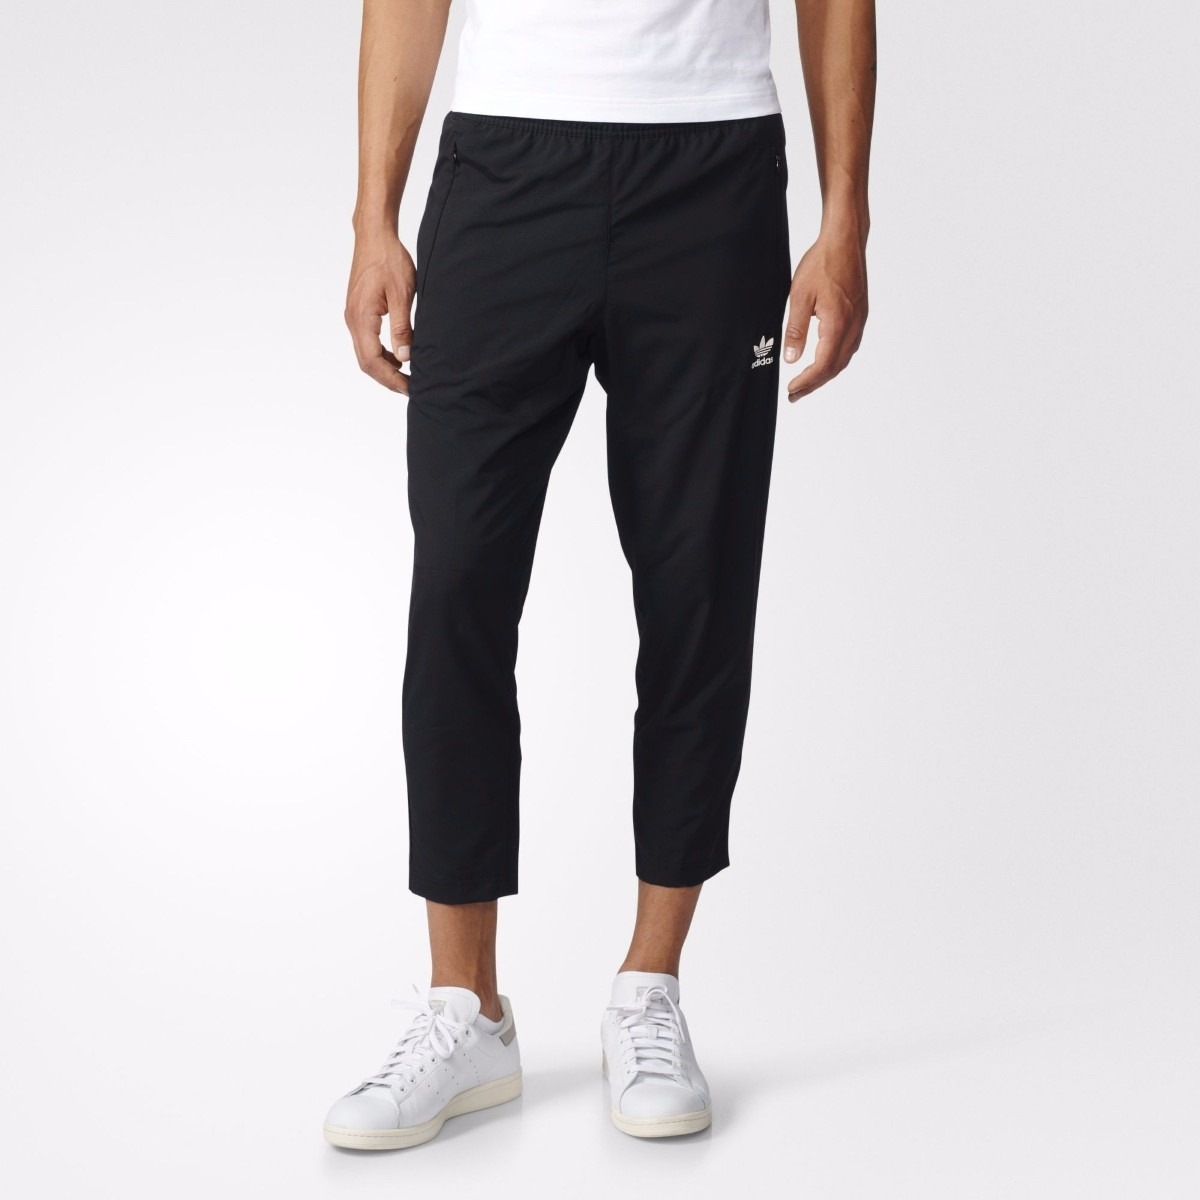 pantalón sudadera jogger adidas 7/8 blk/wvn. Cargando zoom.